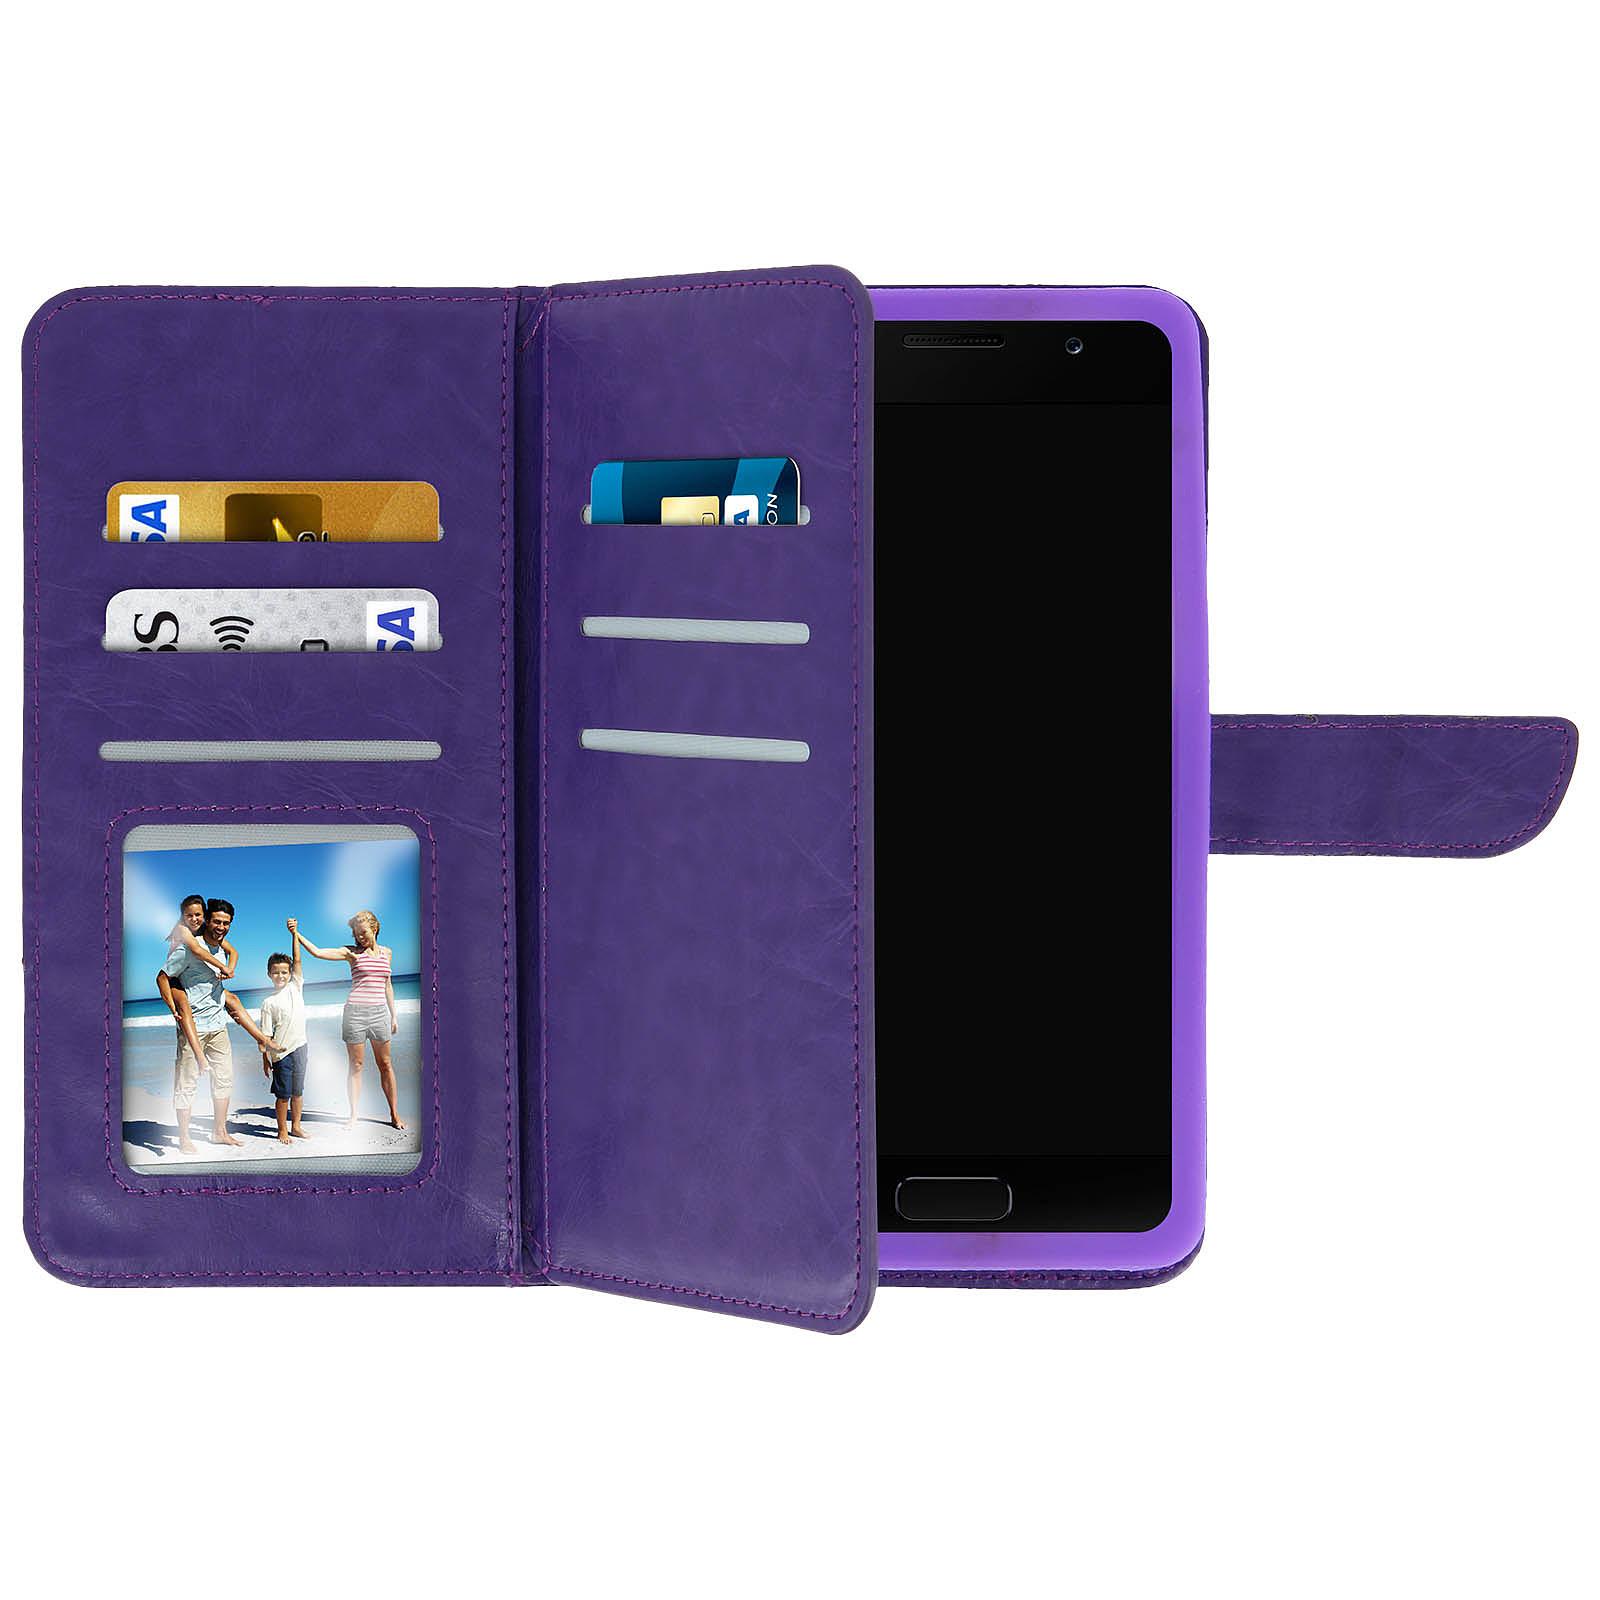 Avizar Etui folio Violet pour Smartphones de 5.3' à 5.5'